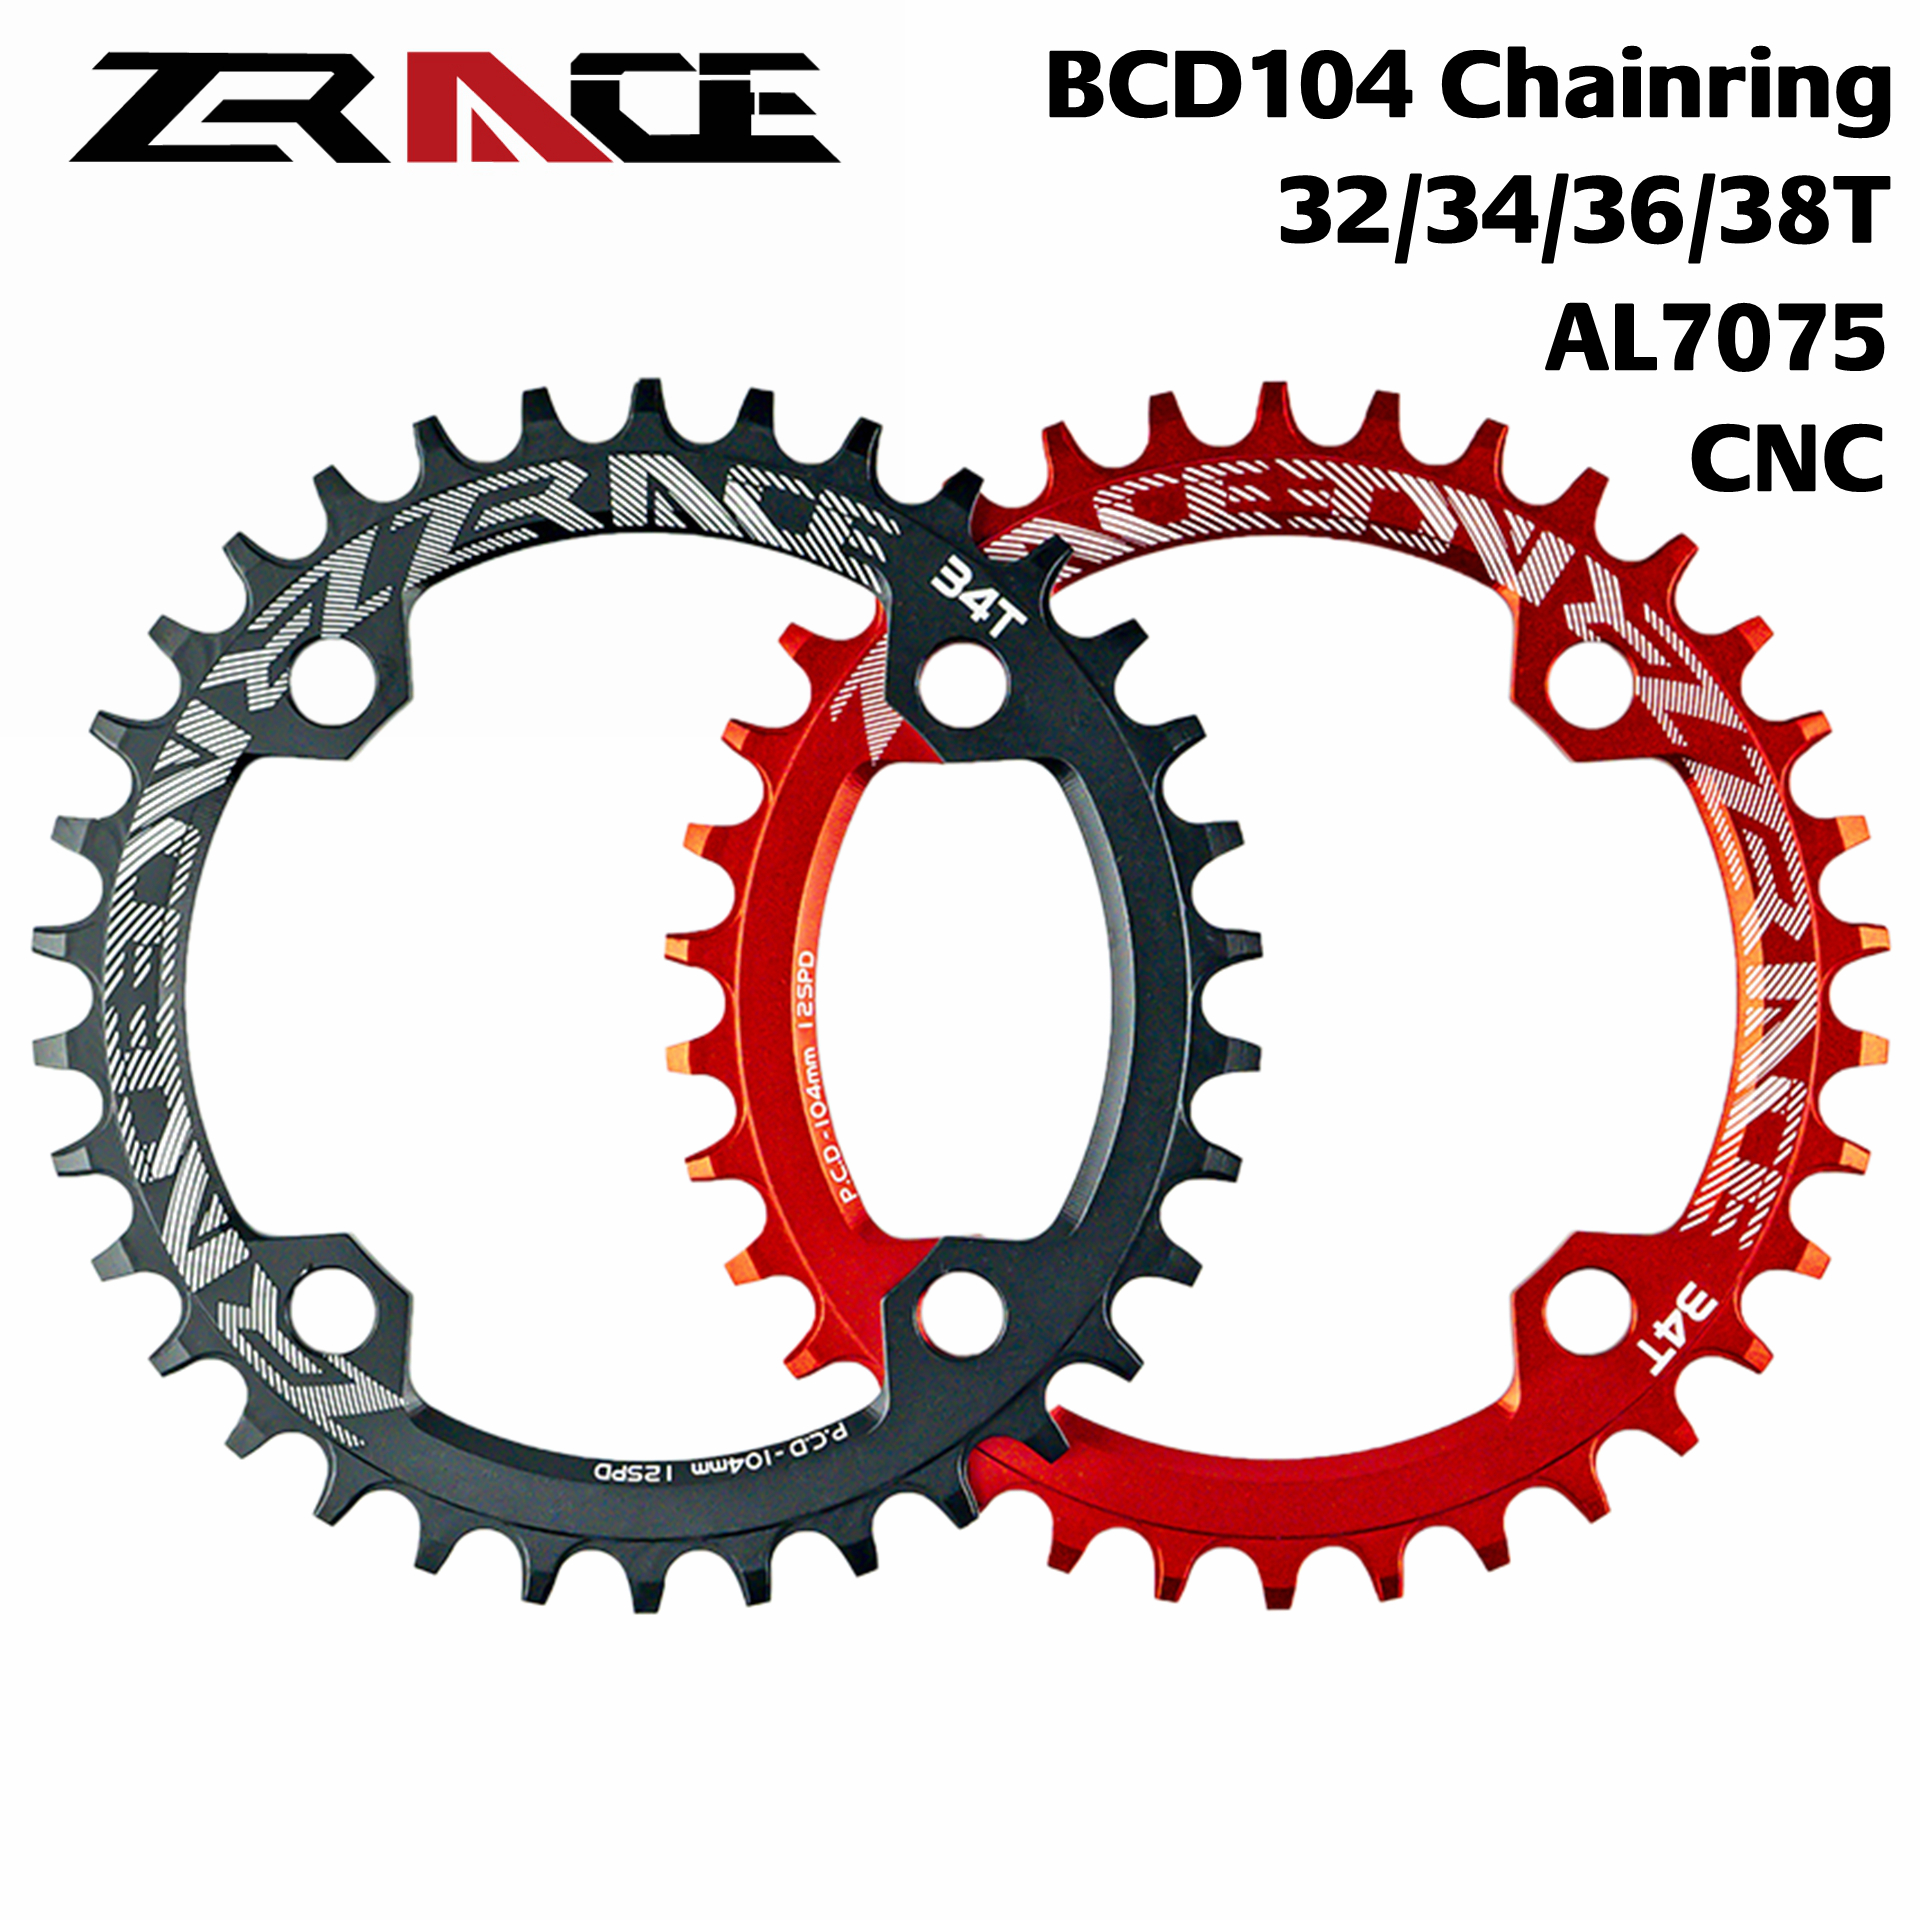 Цепь цепная для горного велосипеда 32 T/34 T/36 T/38 T BCD104